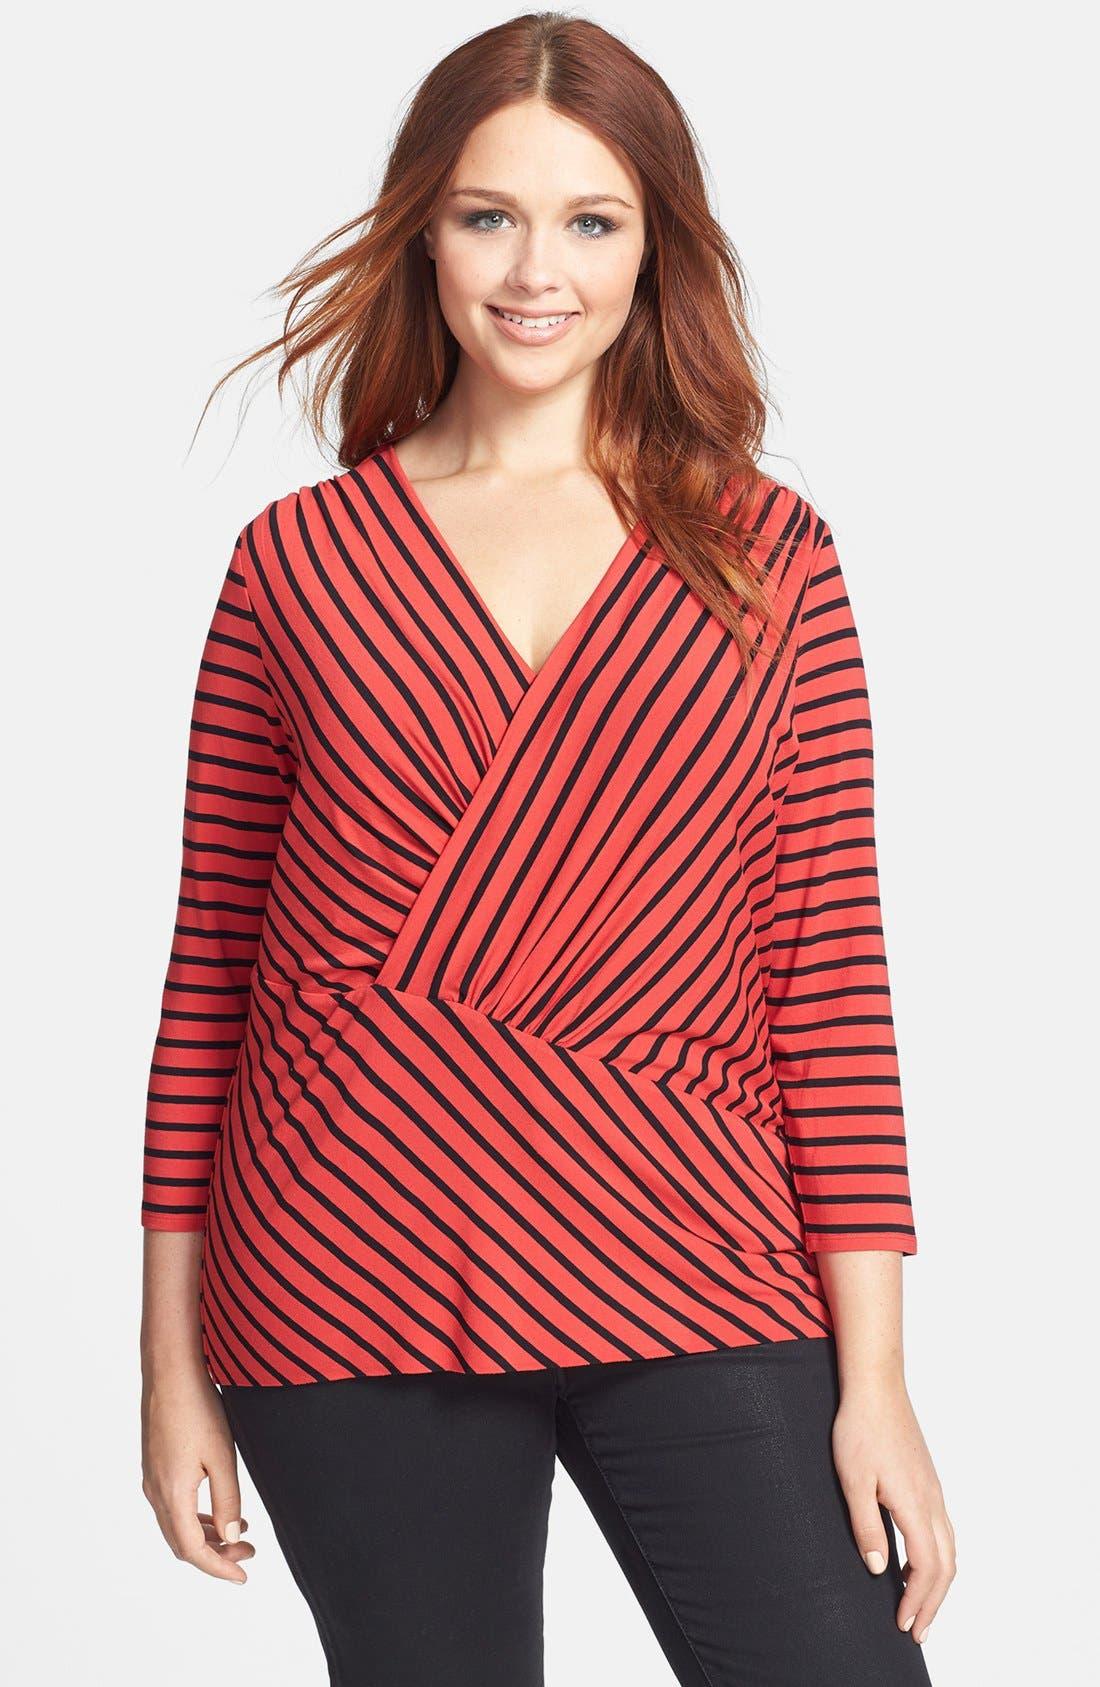 Alternate Image 1 Selected - Vince Camuto 'Retro Stripes' Asymmetrical Tunic (Plus Size)